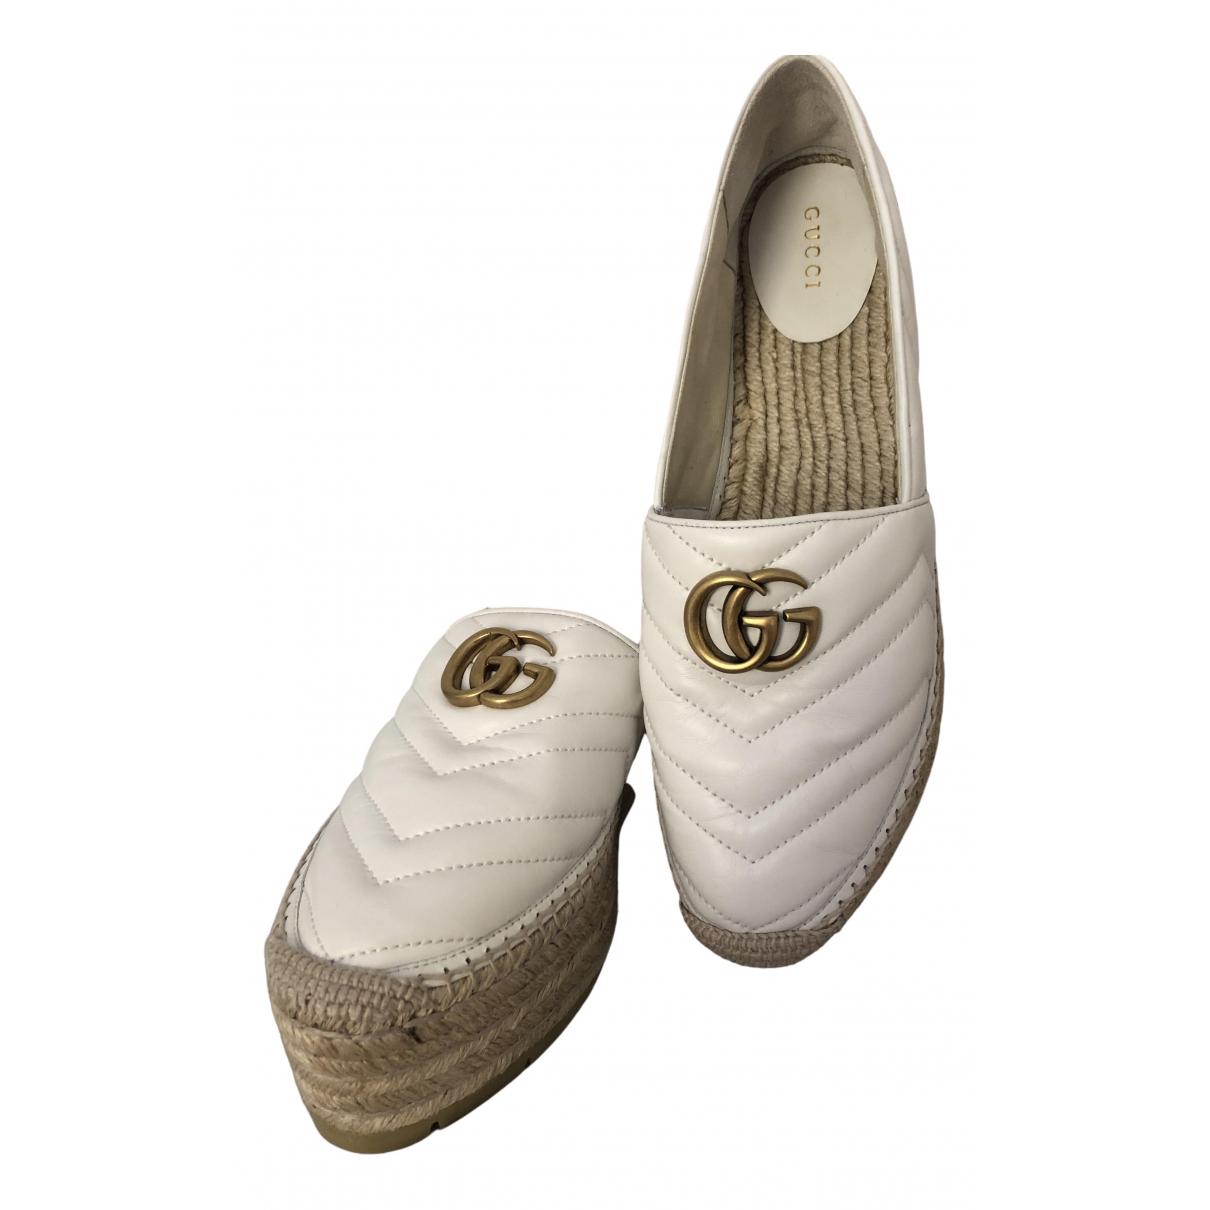 Gucci \N Espadrilles in  Weiss Leder